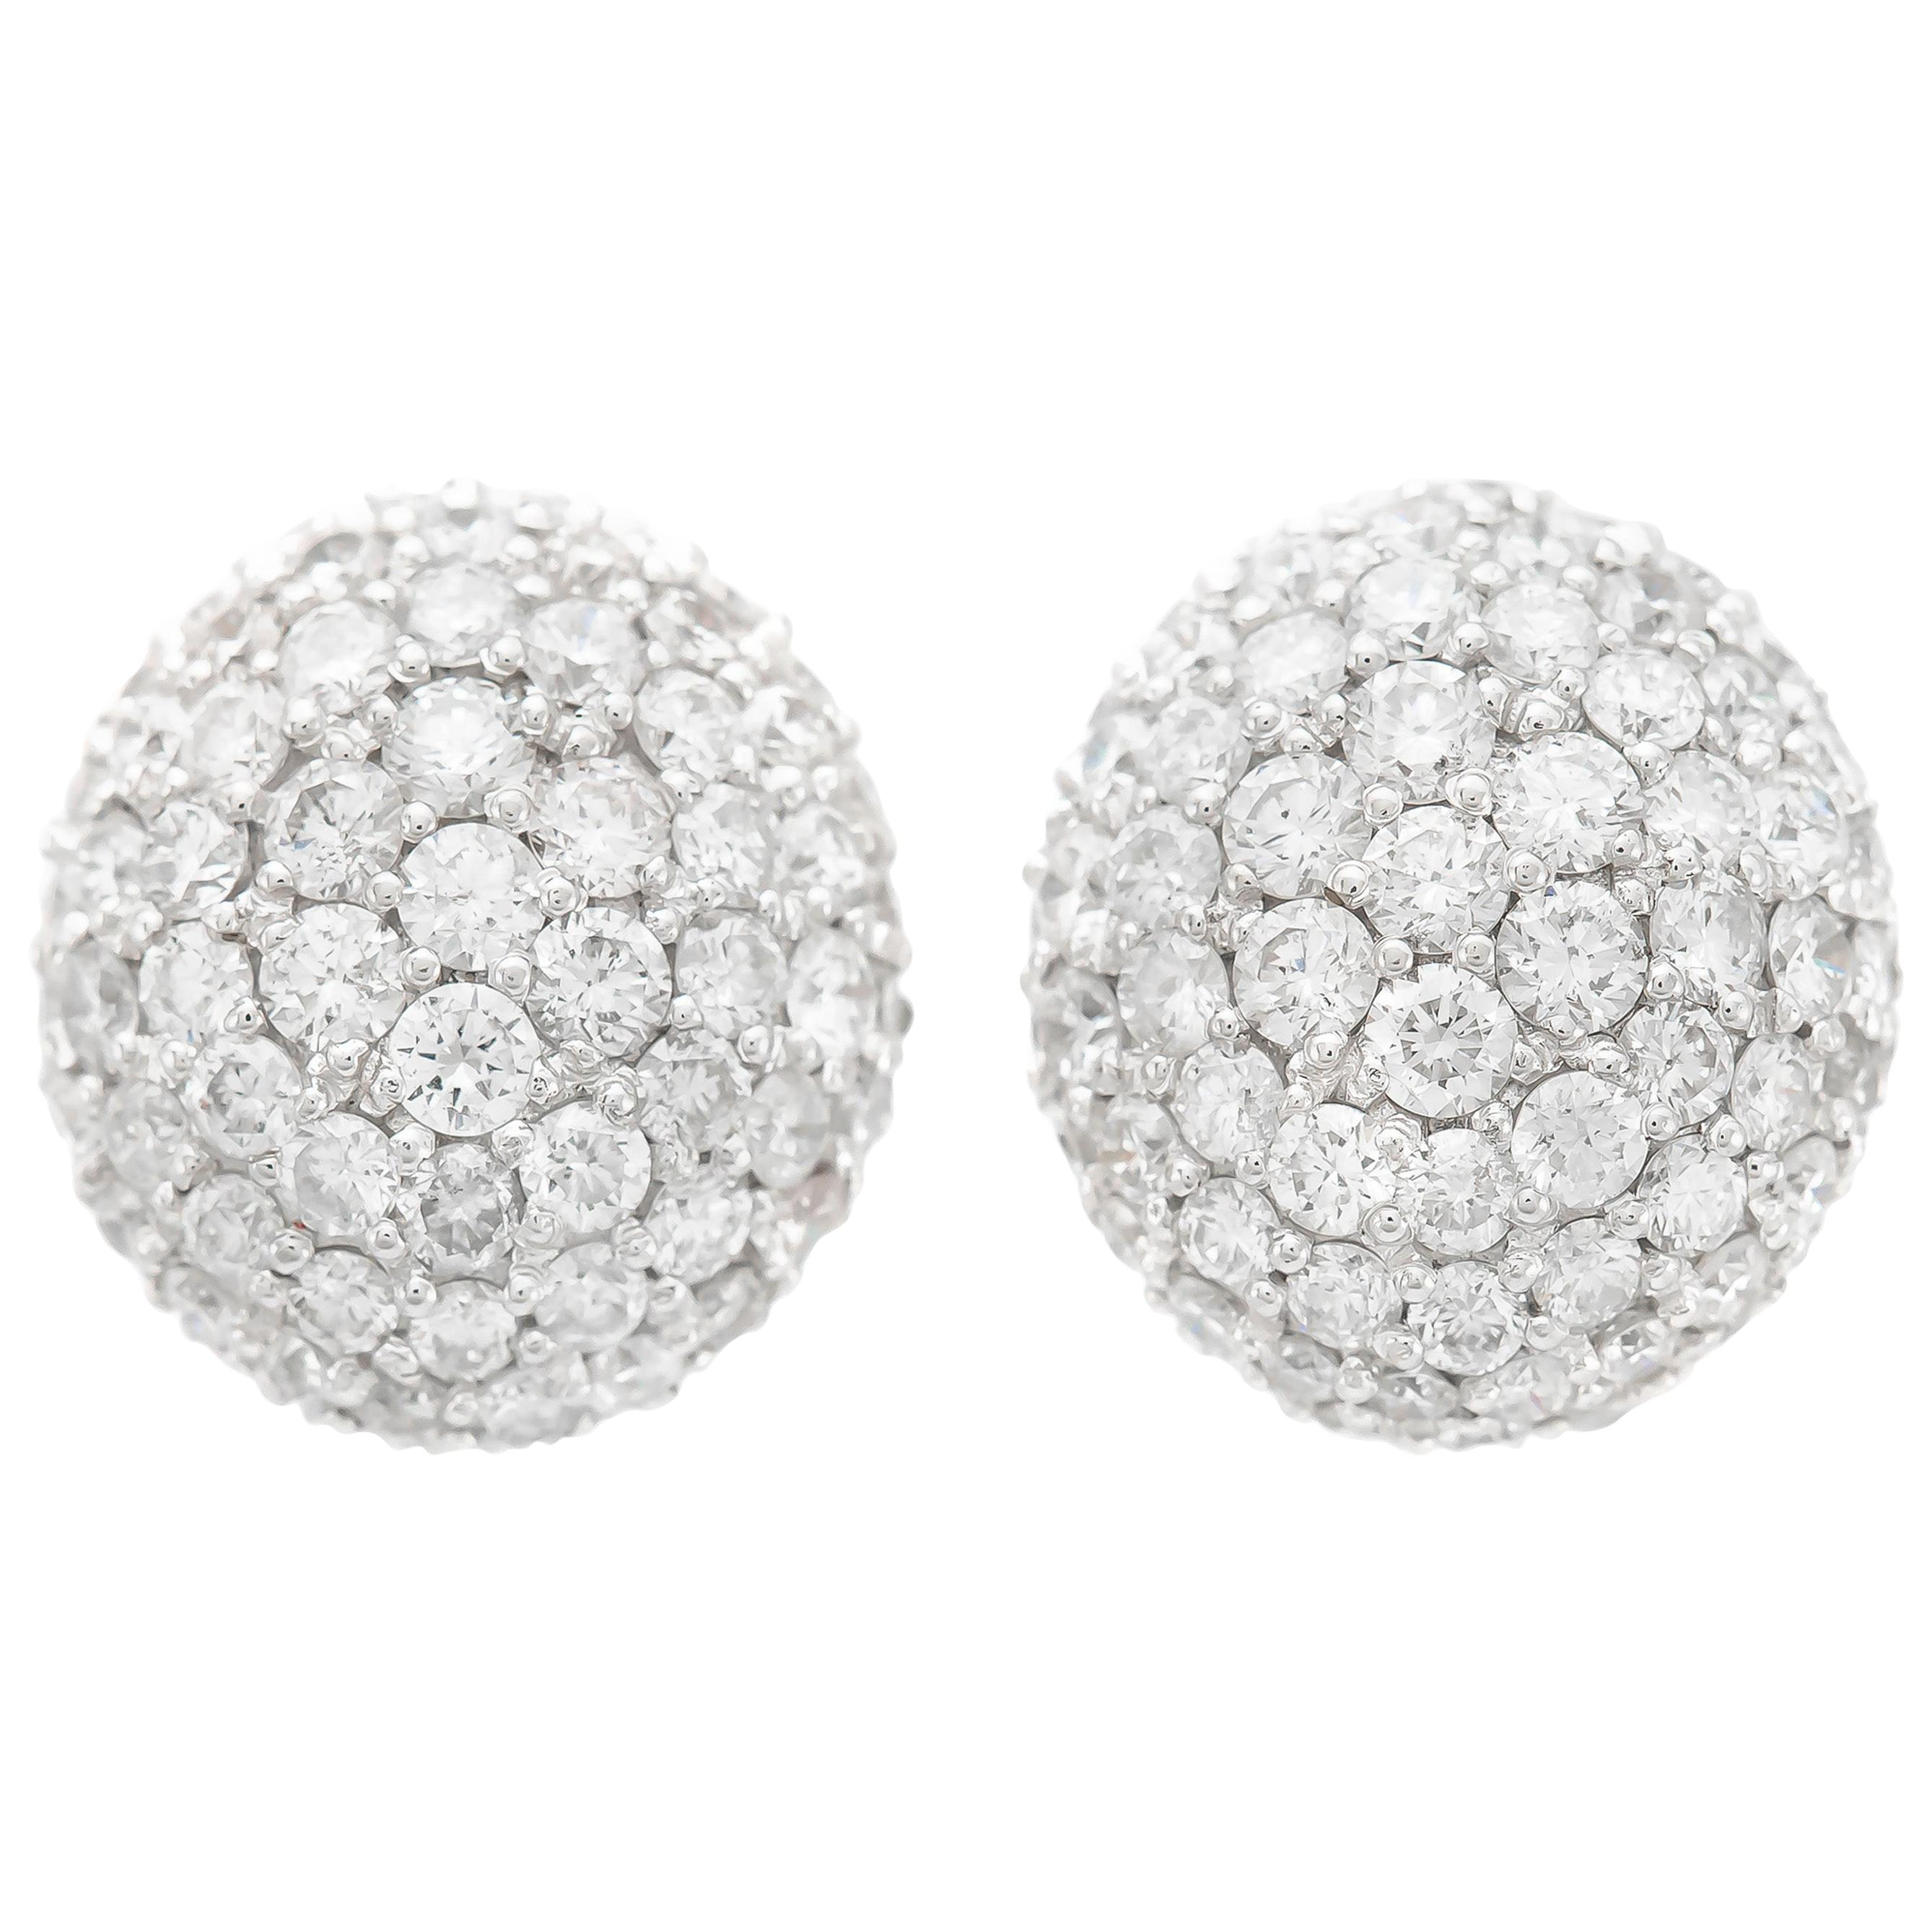 7.00 Carat Pave Diamond Earrings